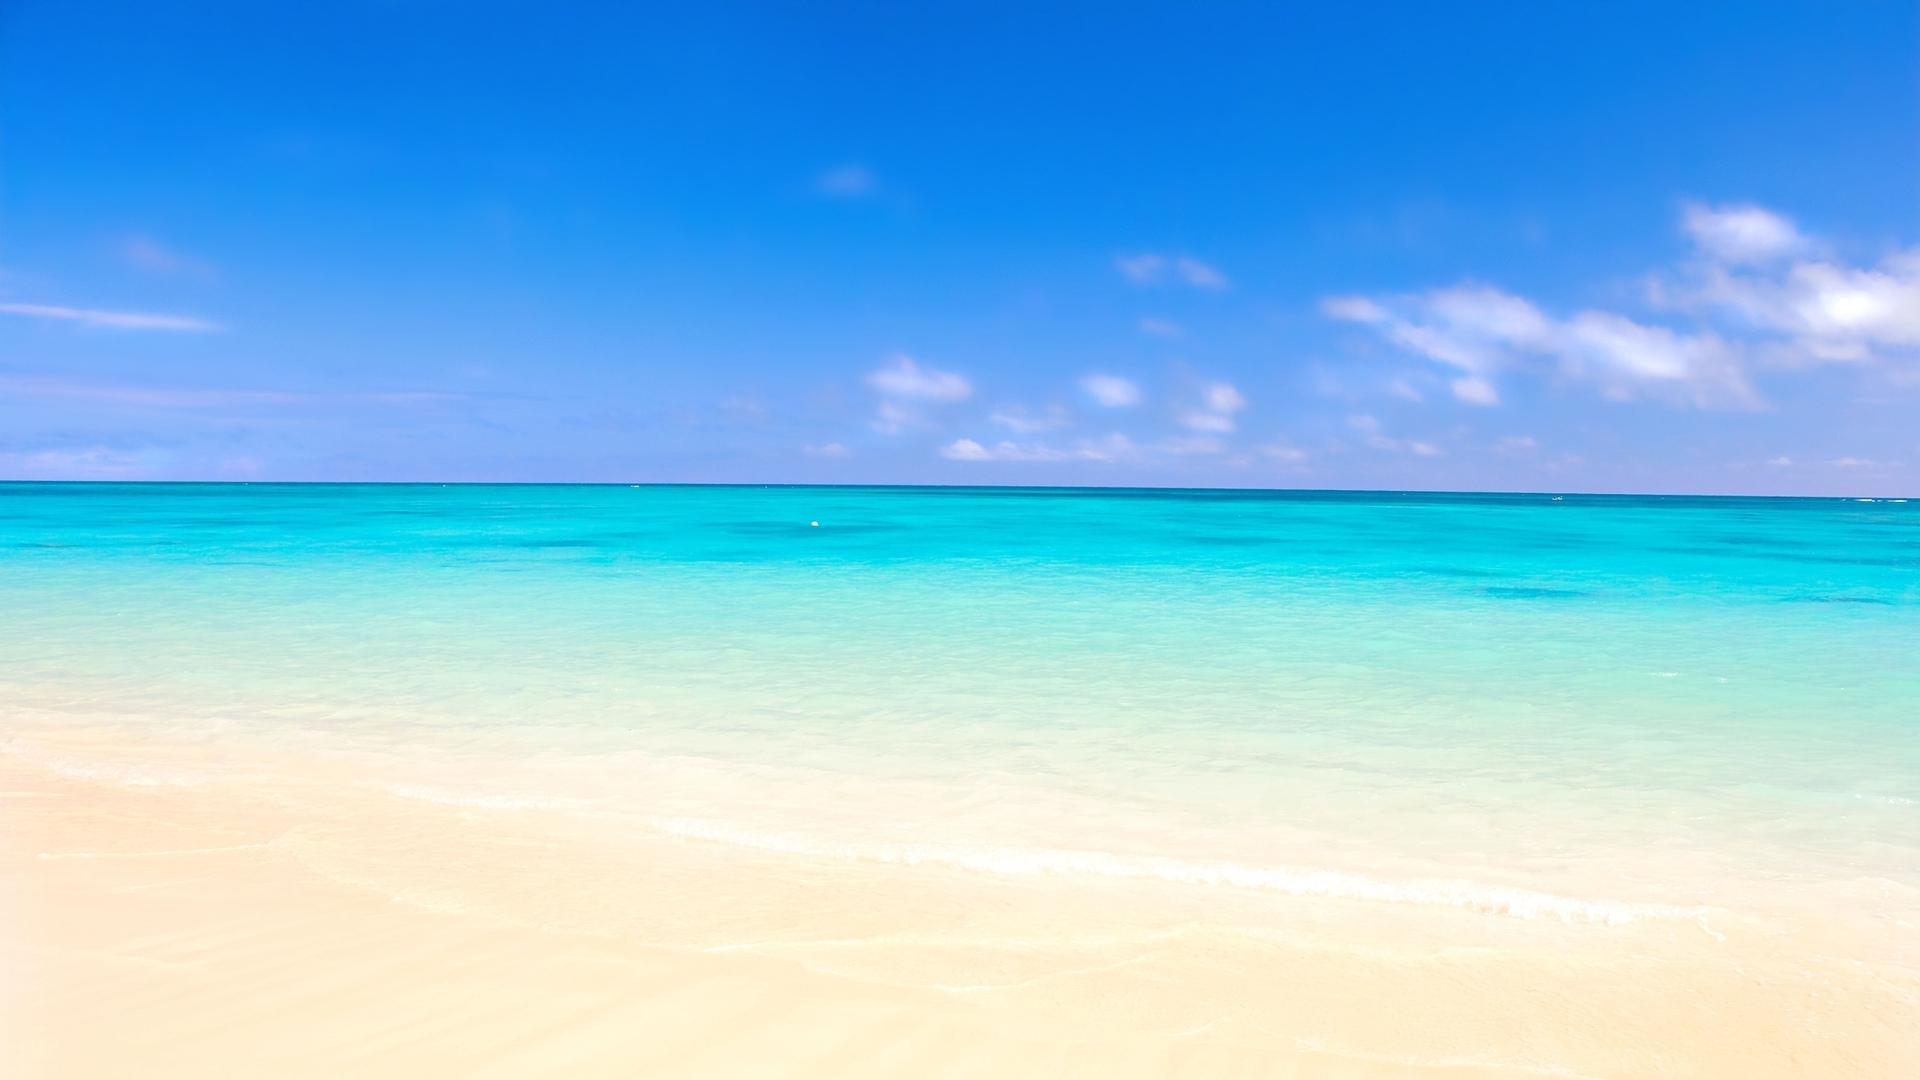 download wallpaper 1920x1080 ocean, sand, beach full hd 1080p hd